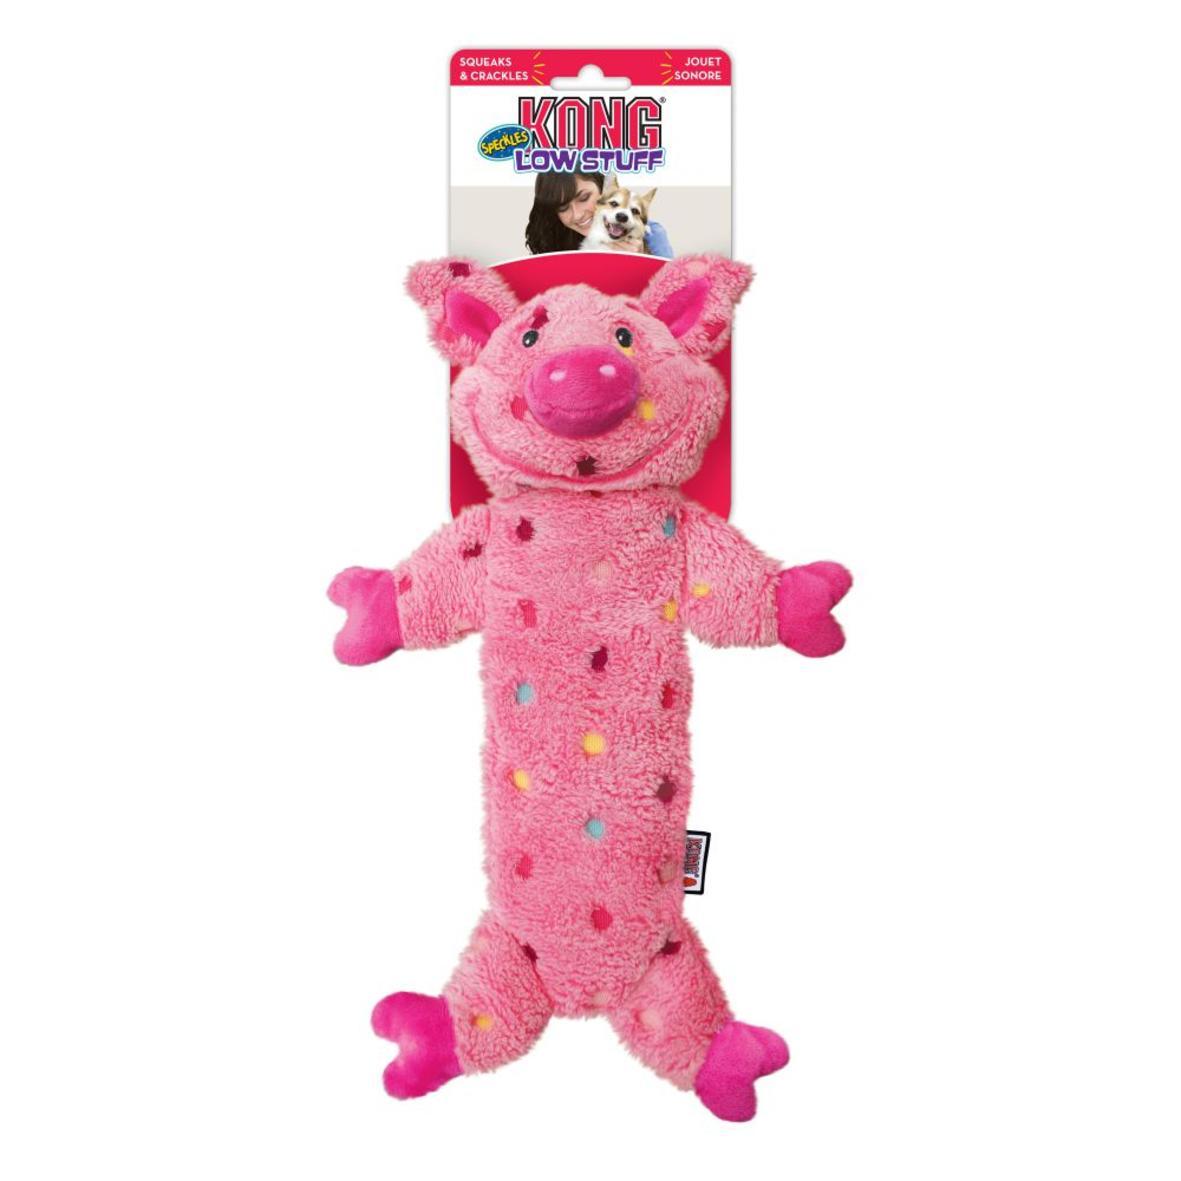 KONG Low Stuff Speckles Pig 40cm